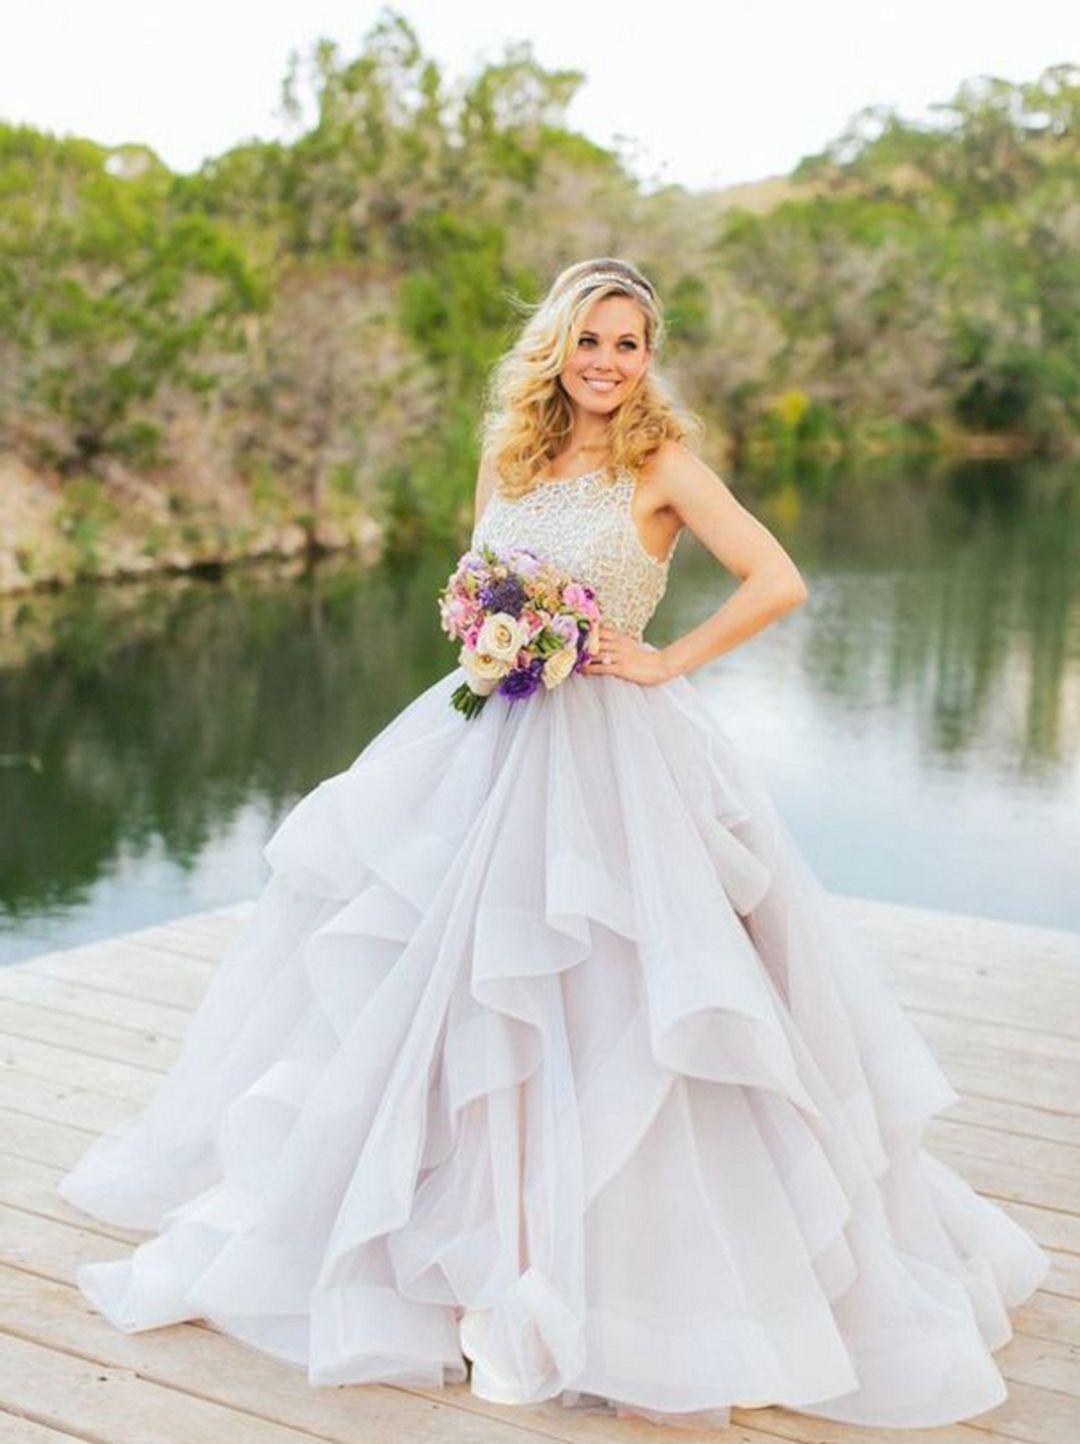 Wonderful 30 Pastel Wedding Dresses Design For Bride Looks More ...